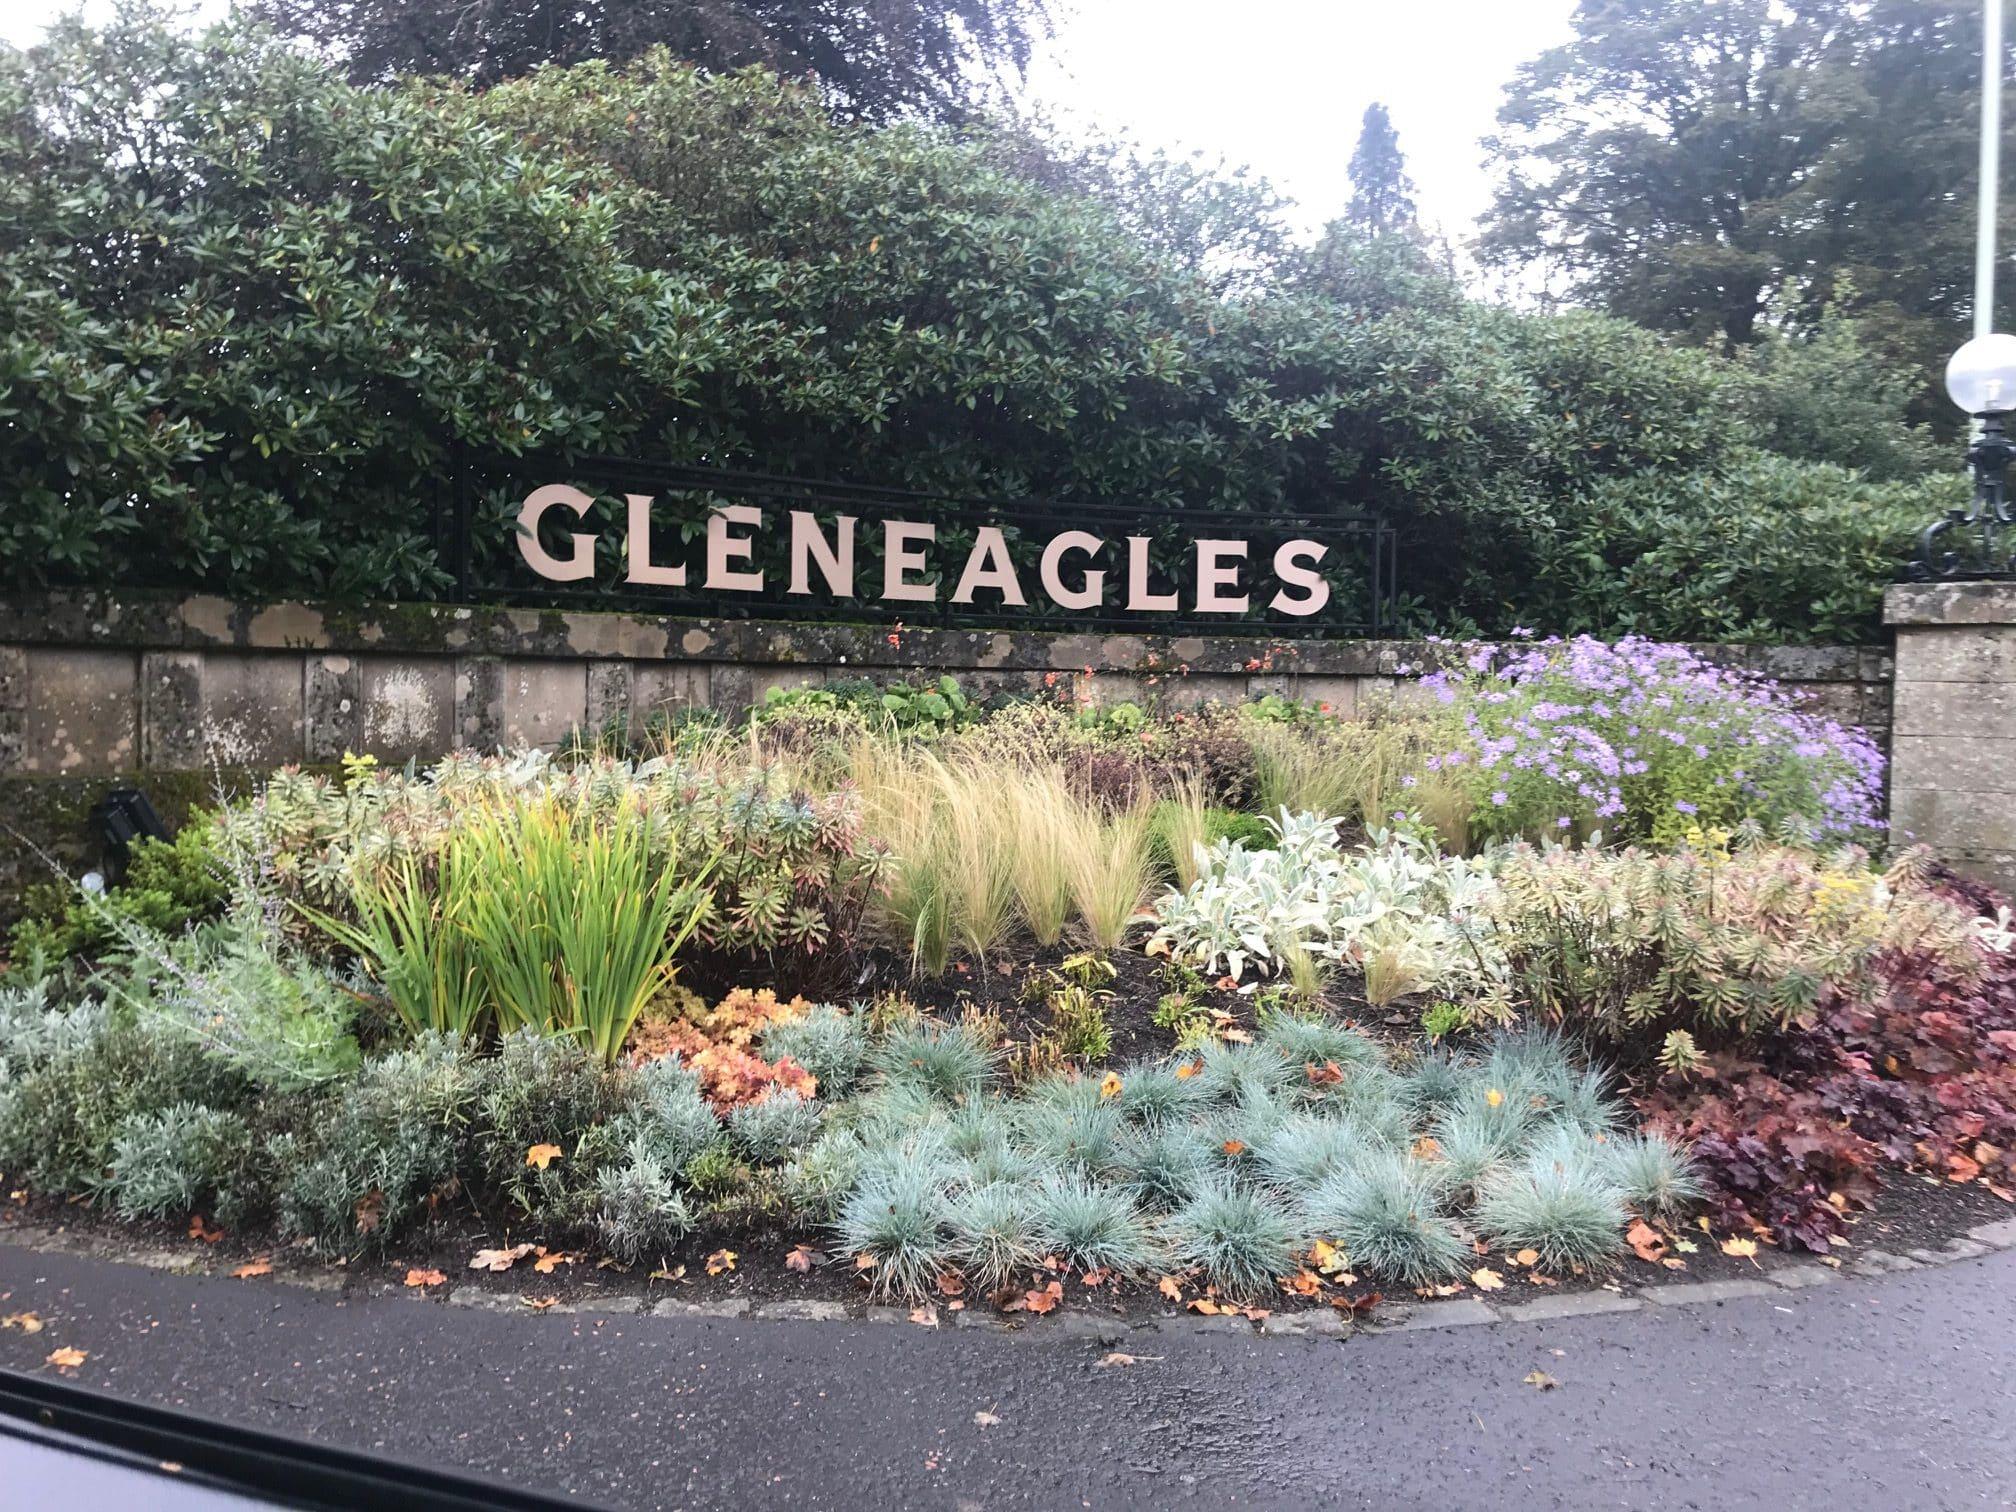 Gleneagles Gate